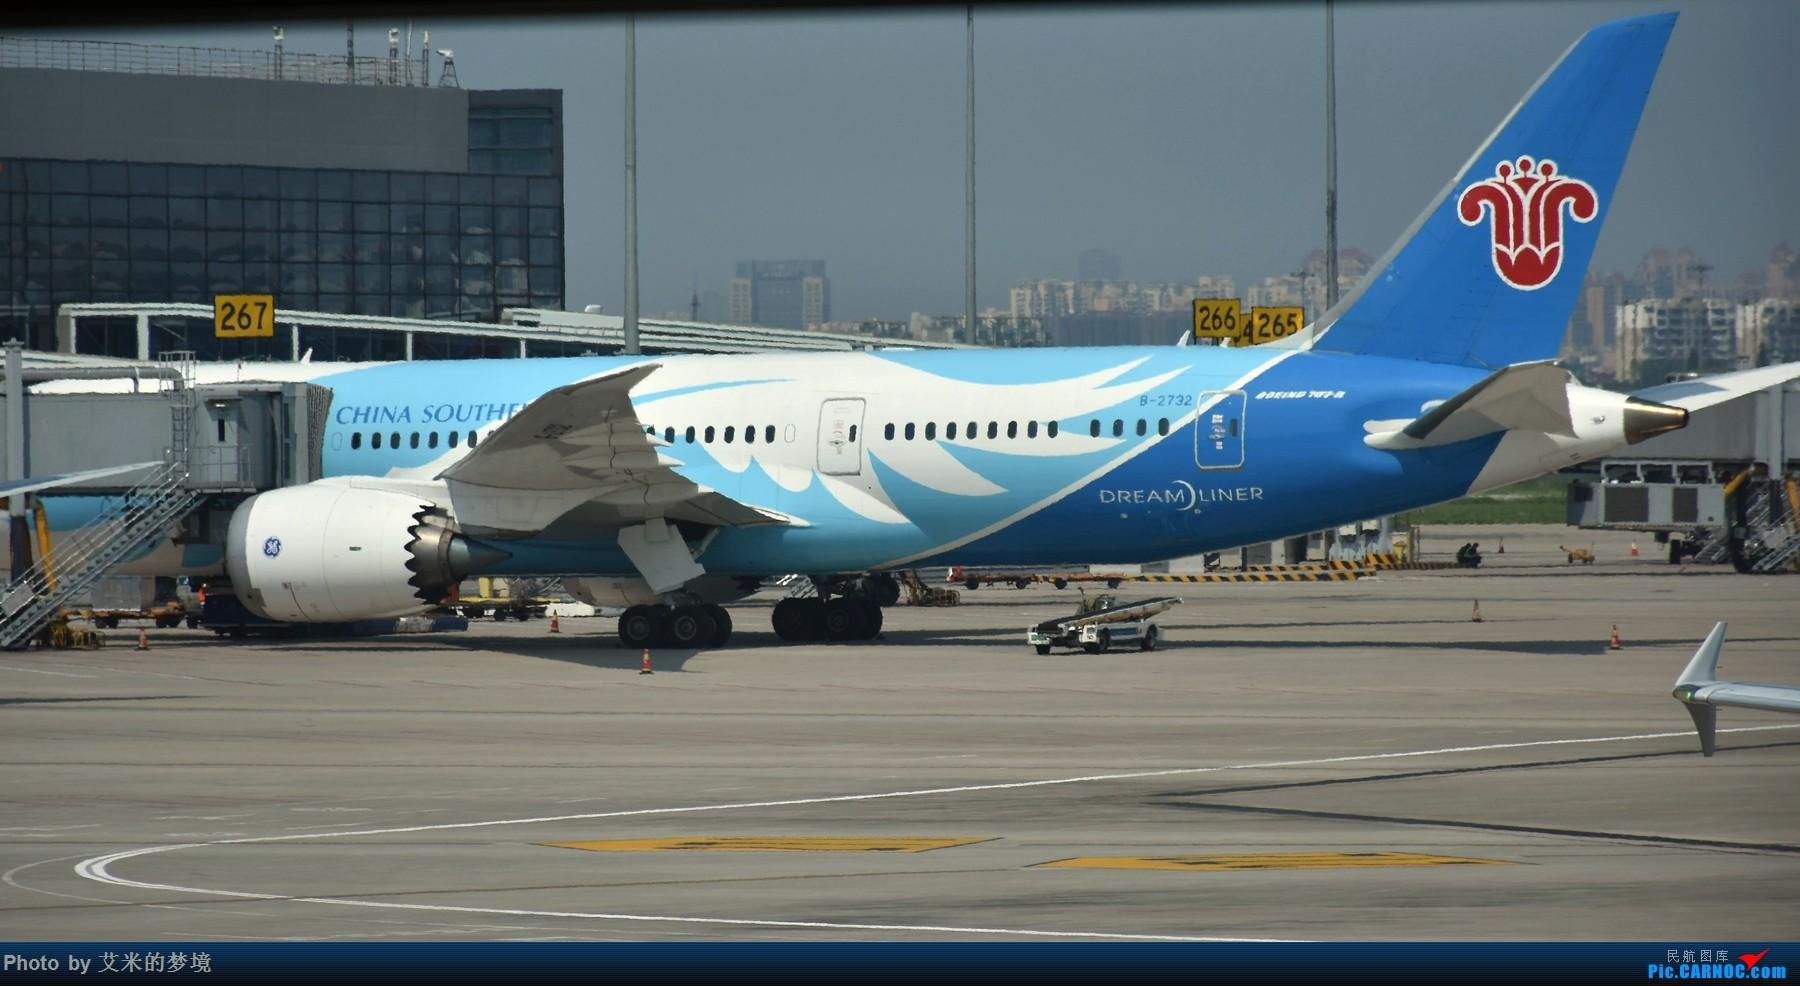 Re:[原创]【carnoc重庆飞友会】北京送行,所见飞行 BOEING 787-8 B-2732 中国上海虹桥国际机场